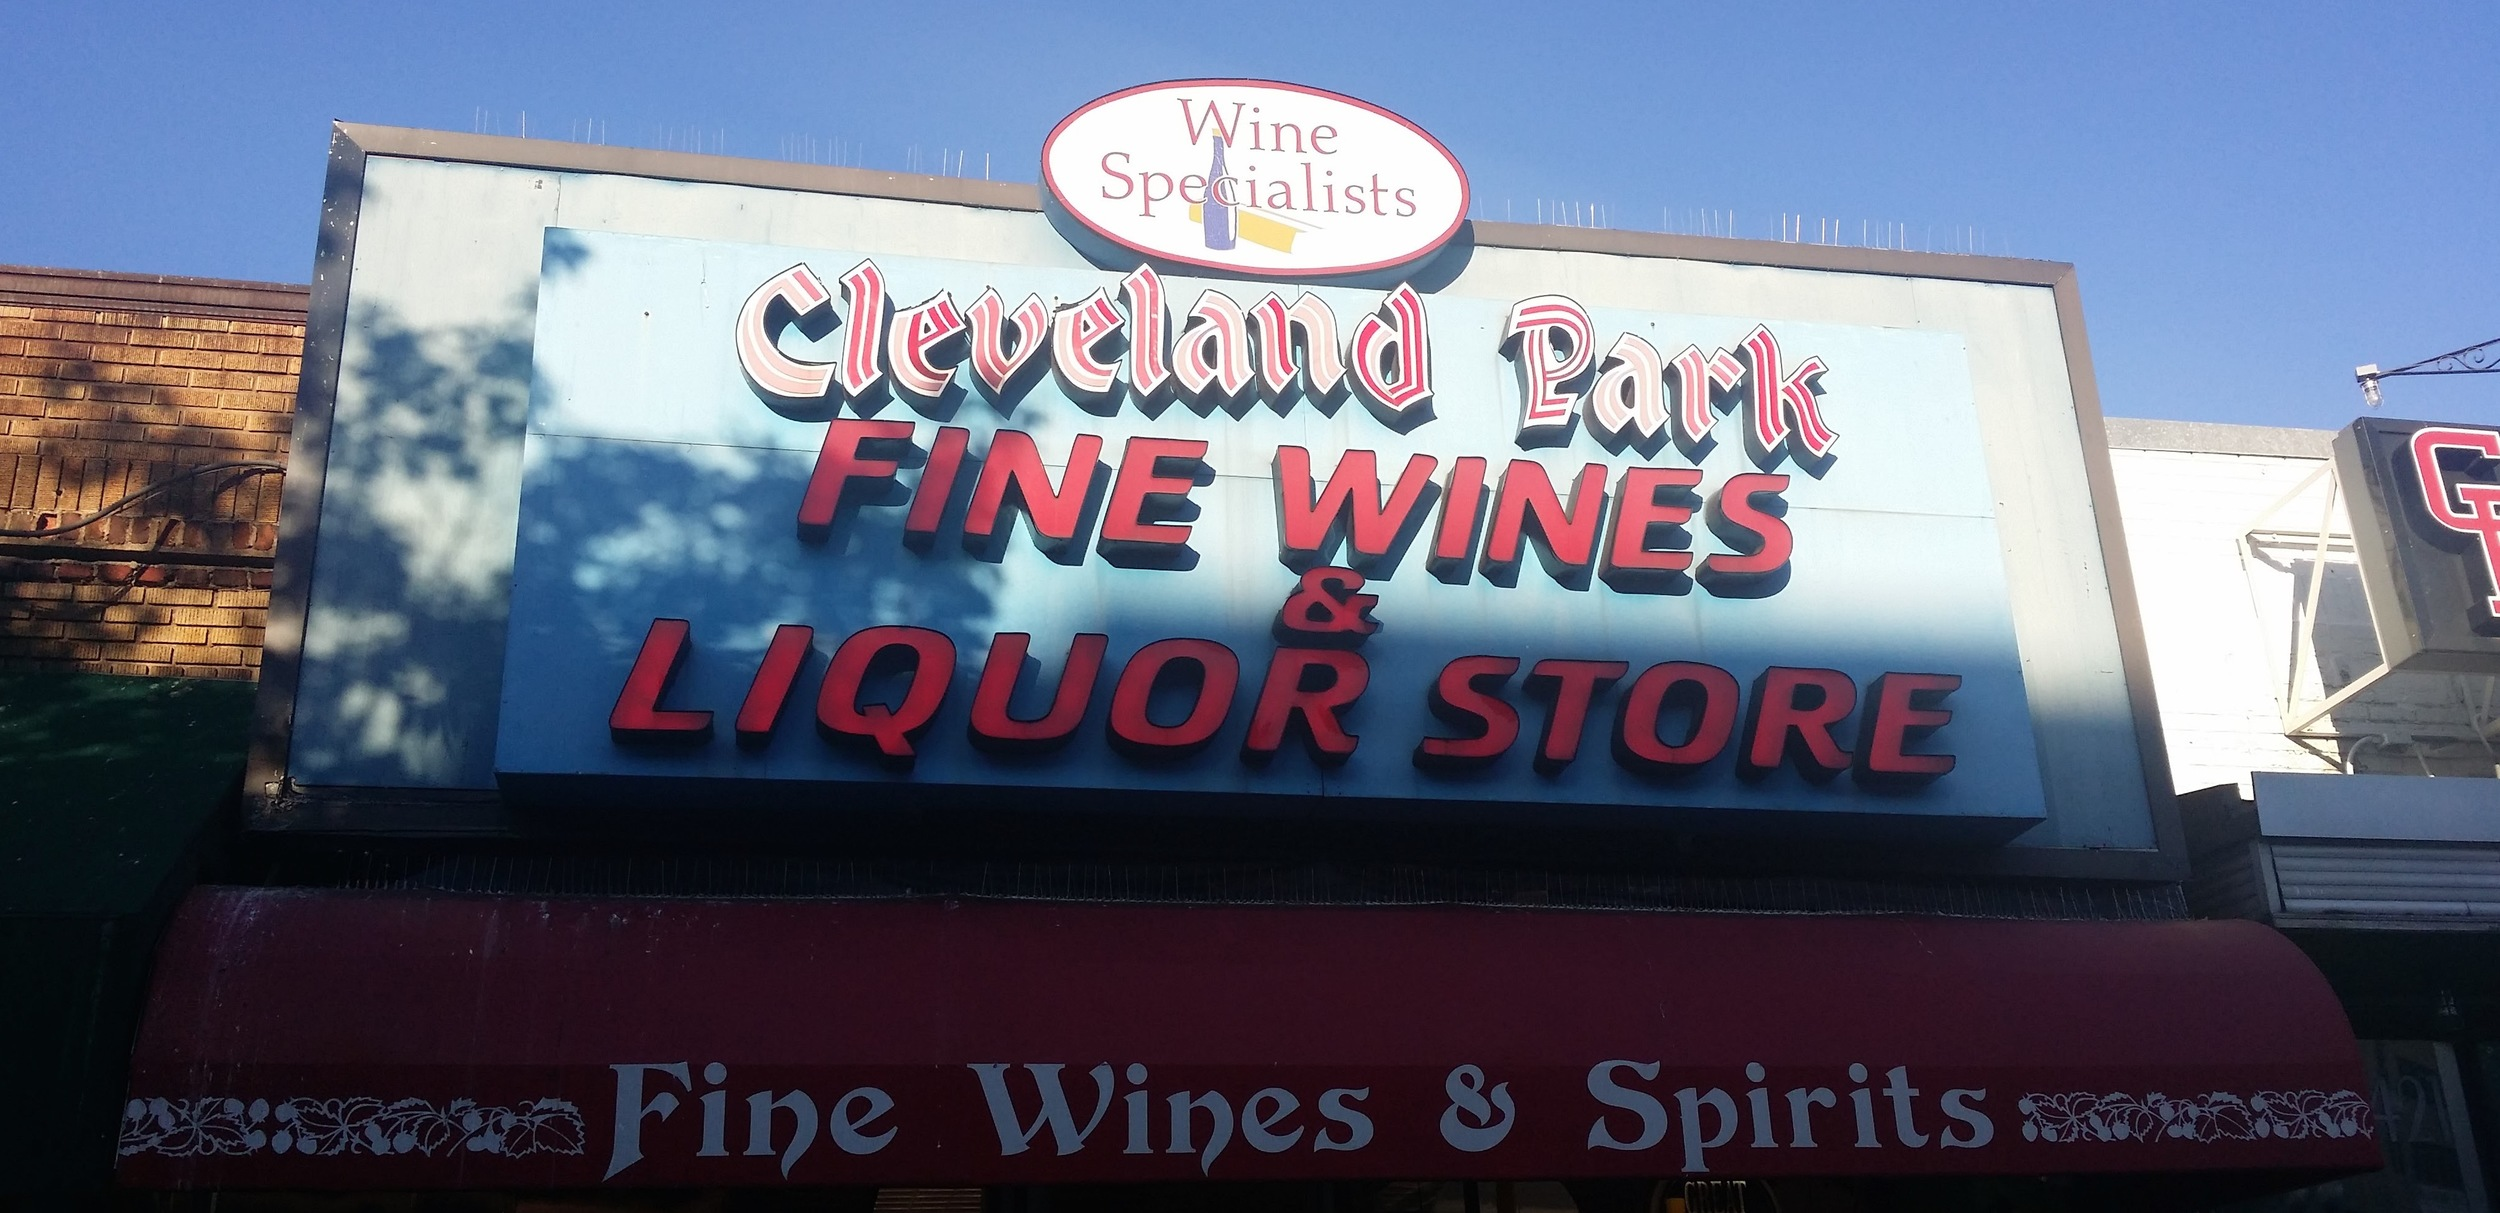 Cleveland Park Wines